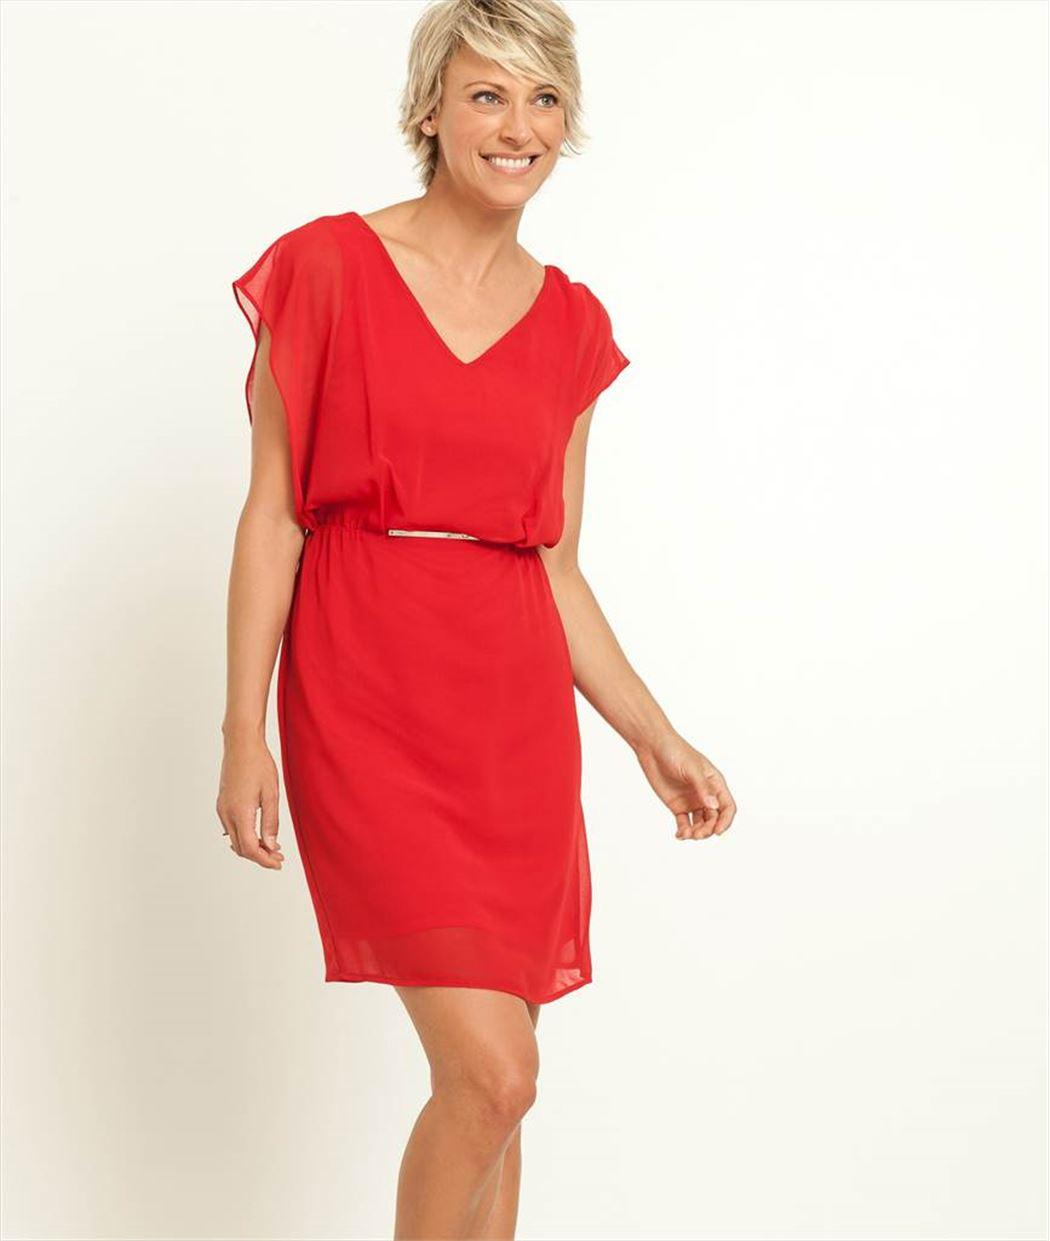 robe femme habill e couleur rouge grain de malice. Black Bedroom Furniture Sets. Home Design Ideas